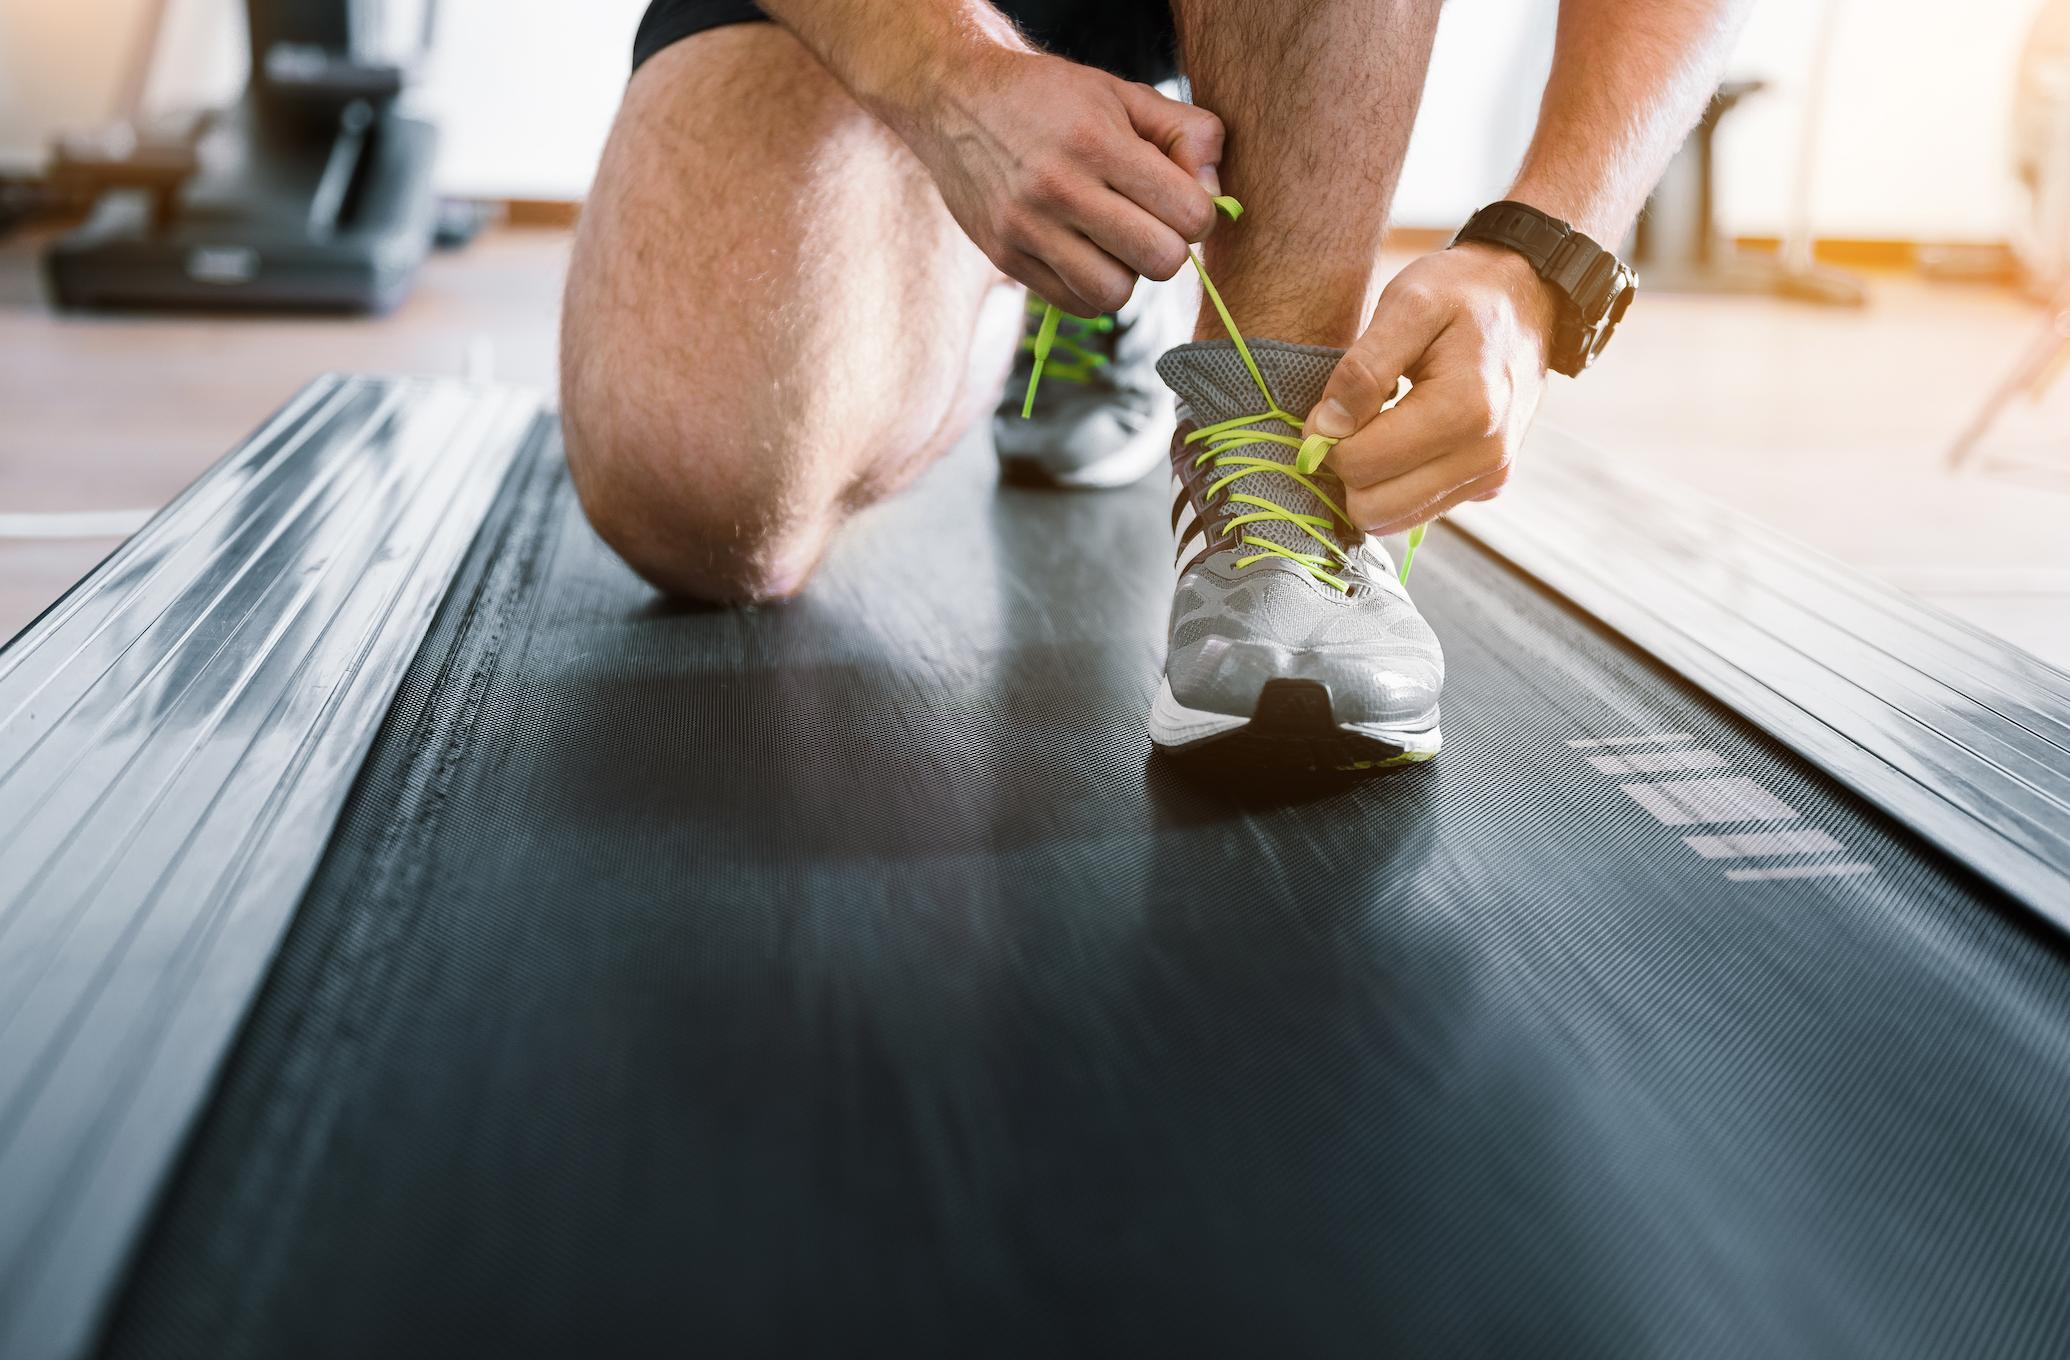 proform smart pro 9000 treadmill review